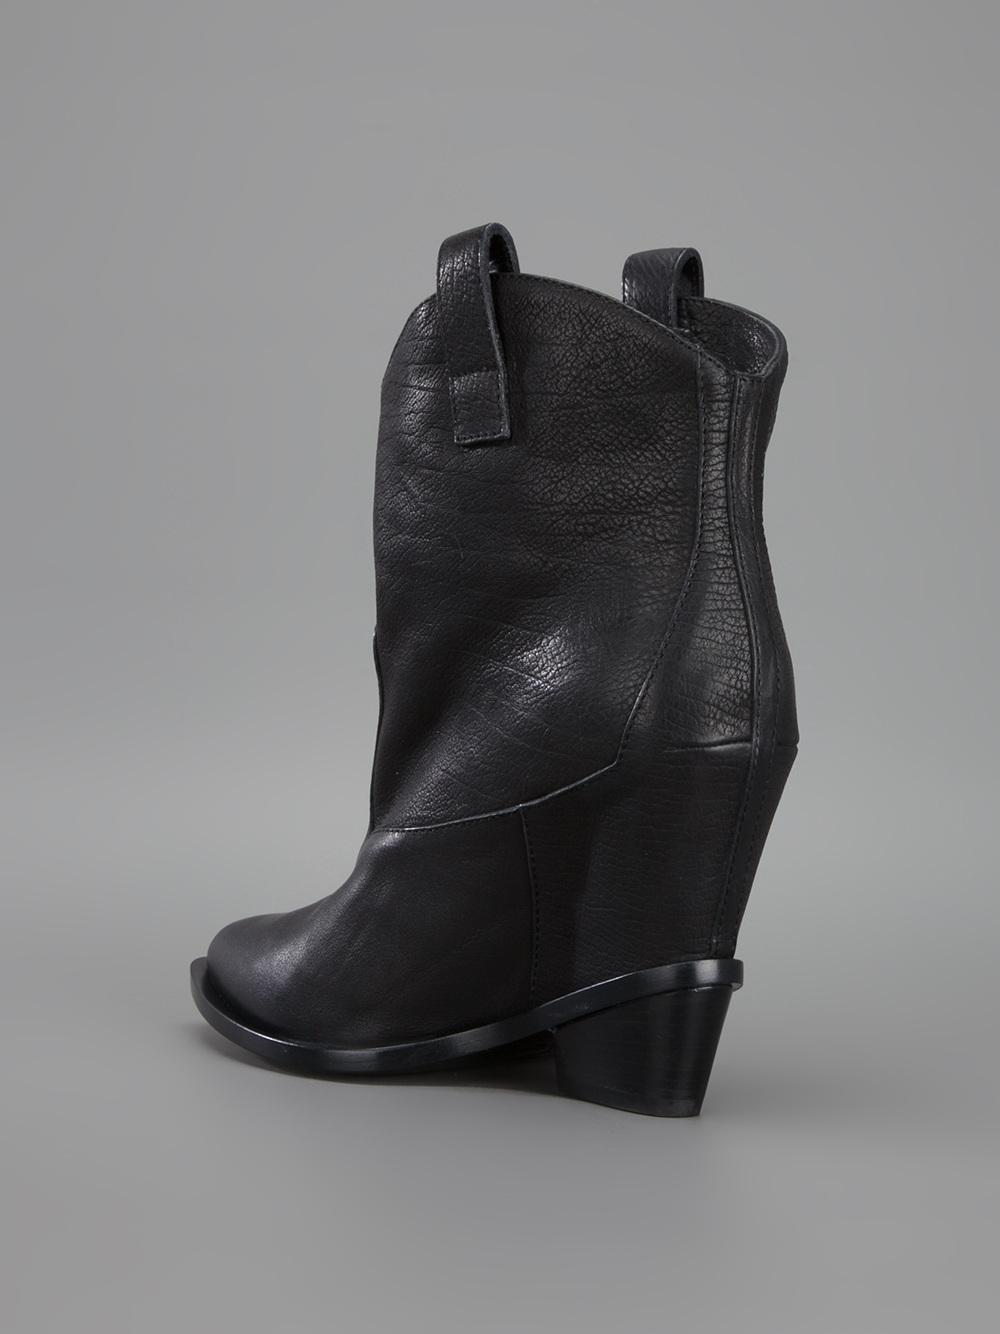 lyst giuseppe zanotti star cowboy boot in black